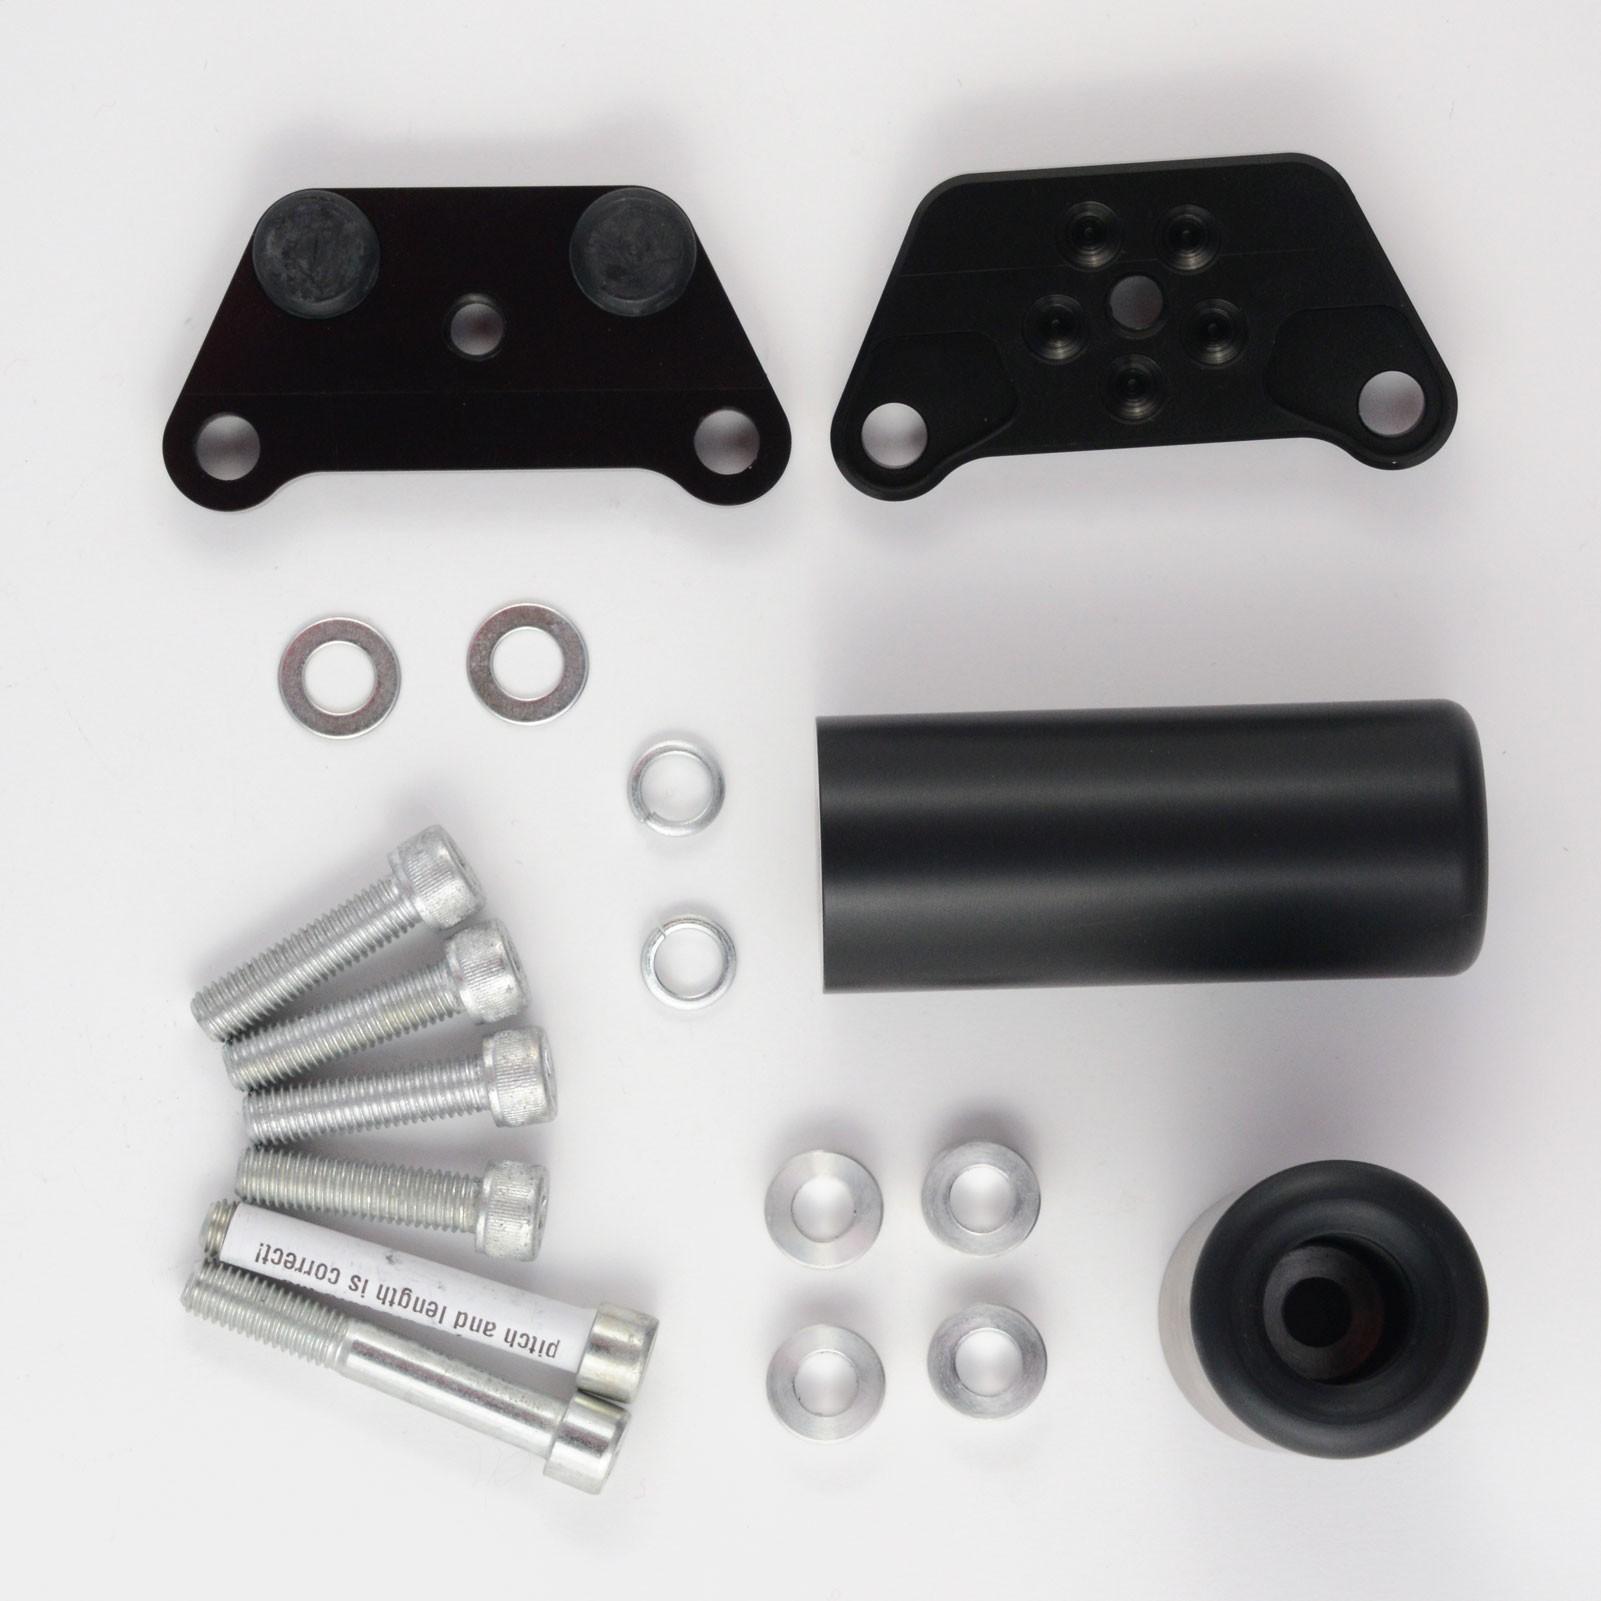 PM-1042-black-a-pro-tamponi-paracarena-protector-frame-slider-sonicmotoshop